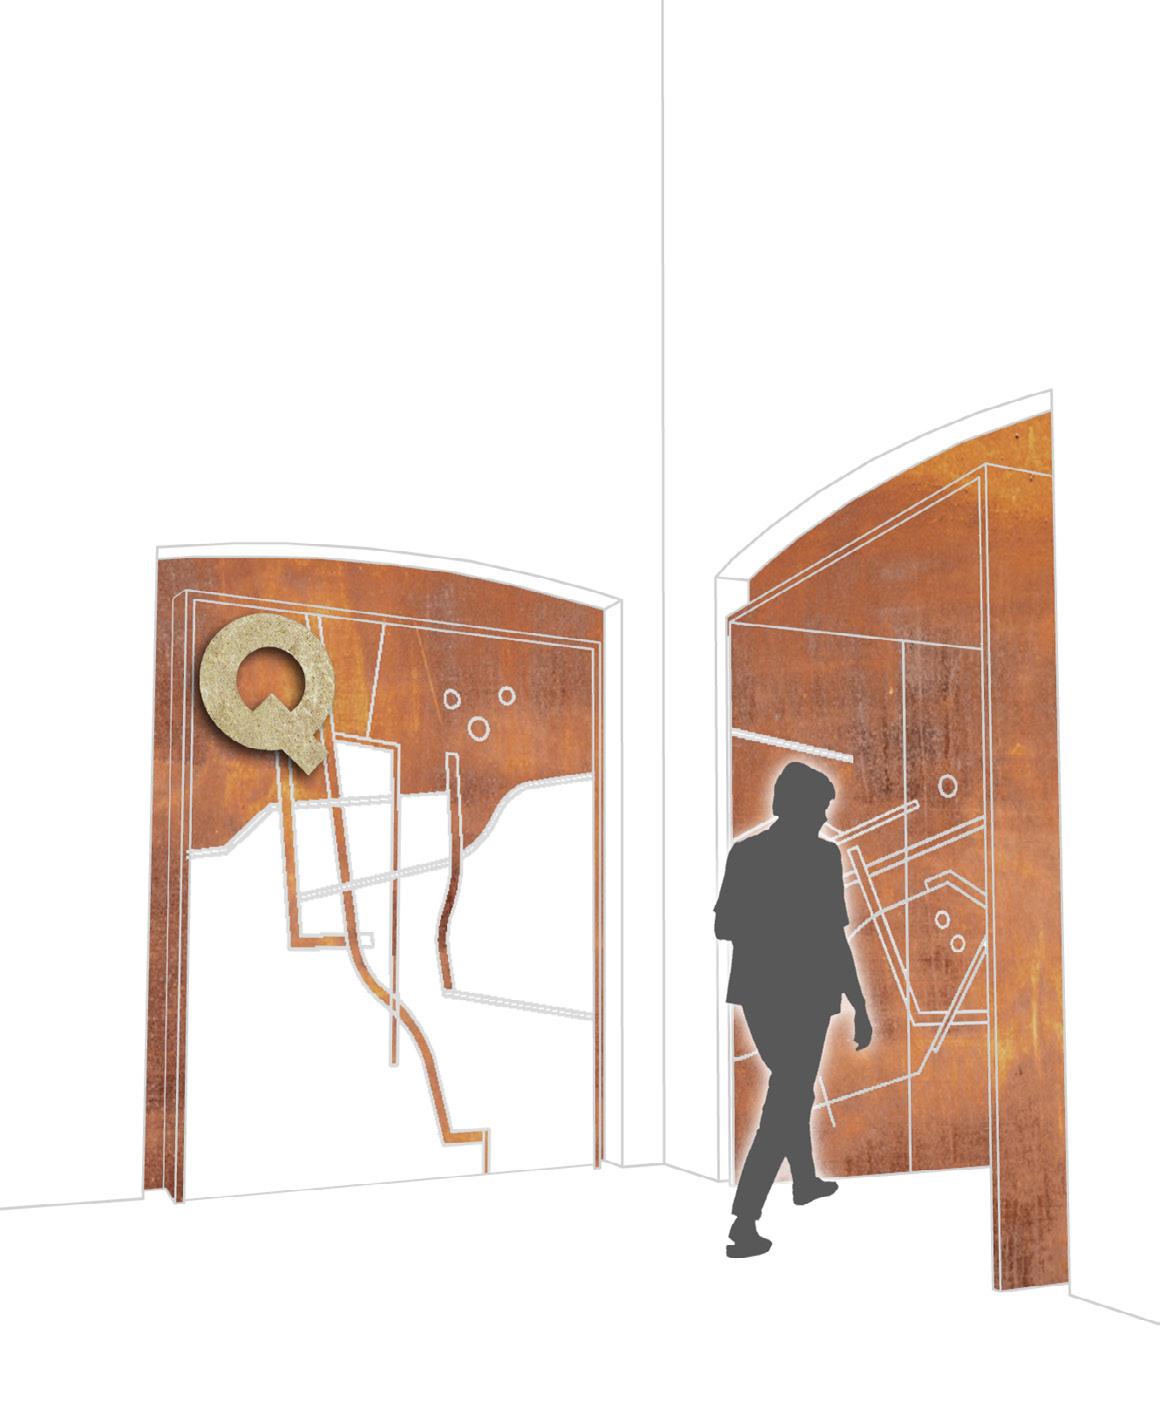 Concurs- nova Caixa Arquitectes de Girona